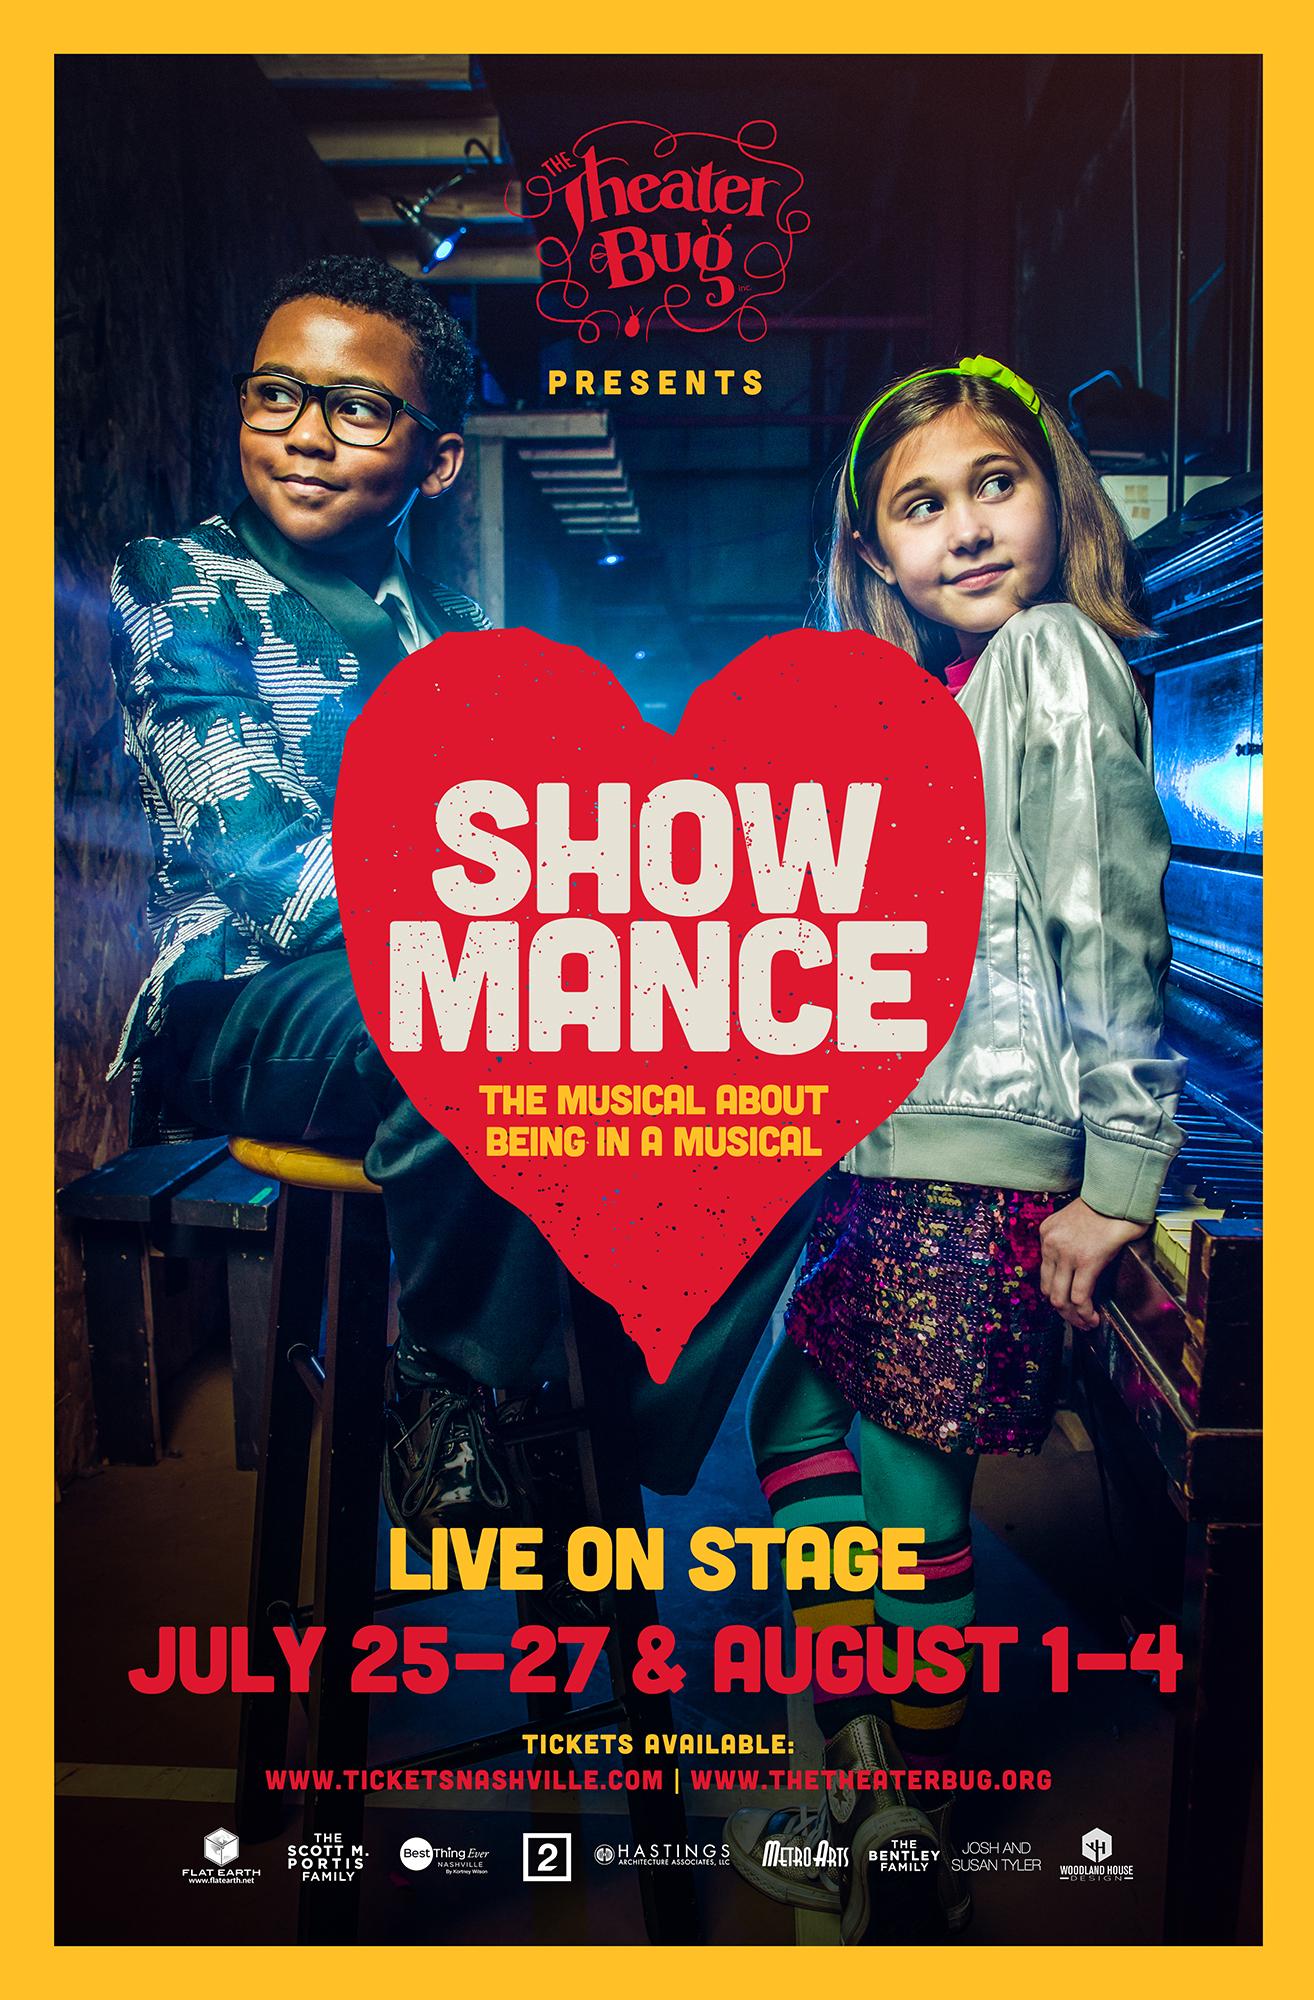 showmance_poster2019_1_web.jpg